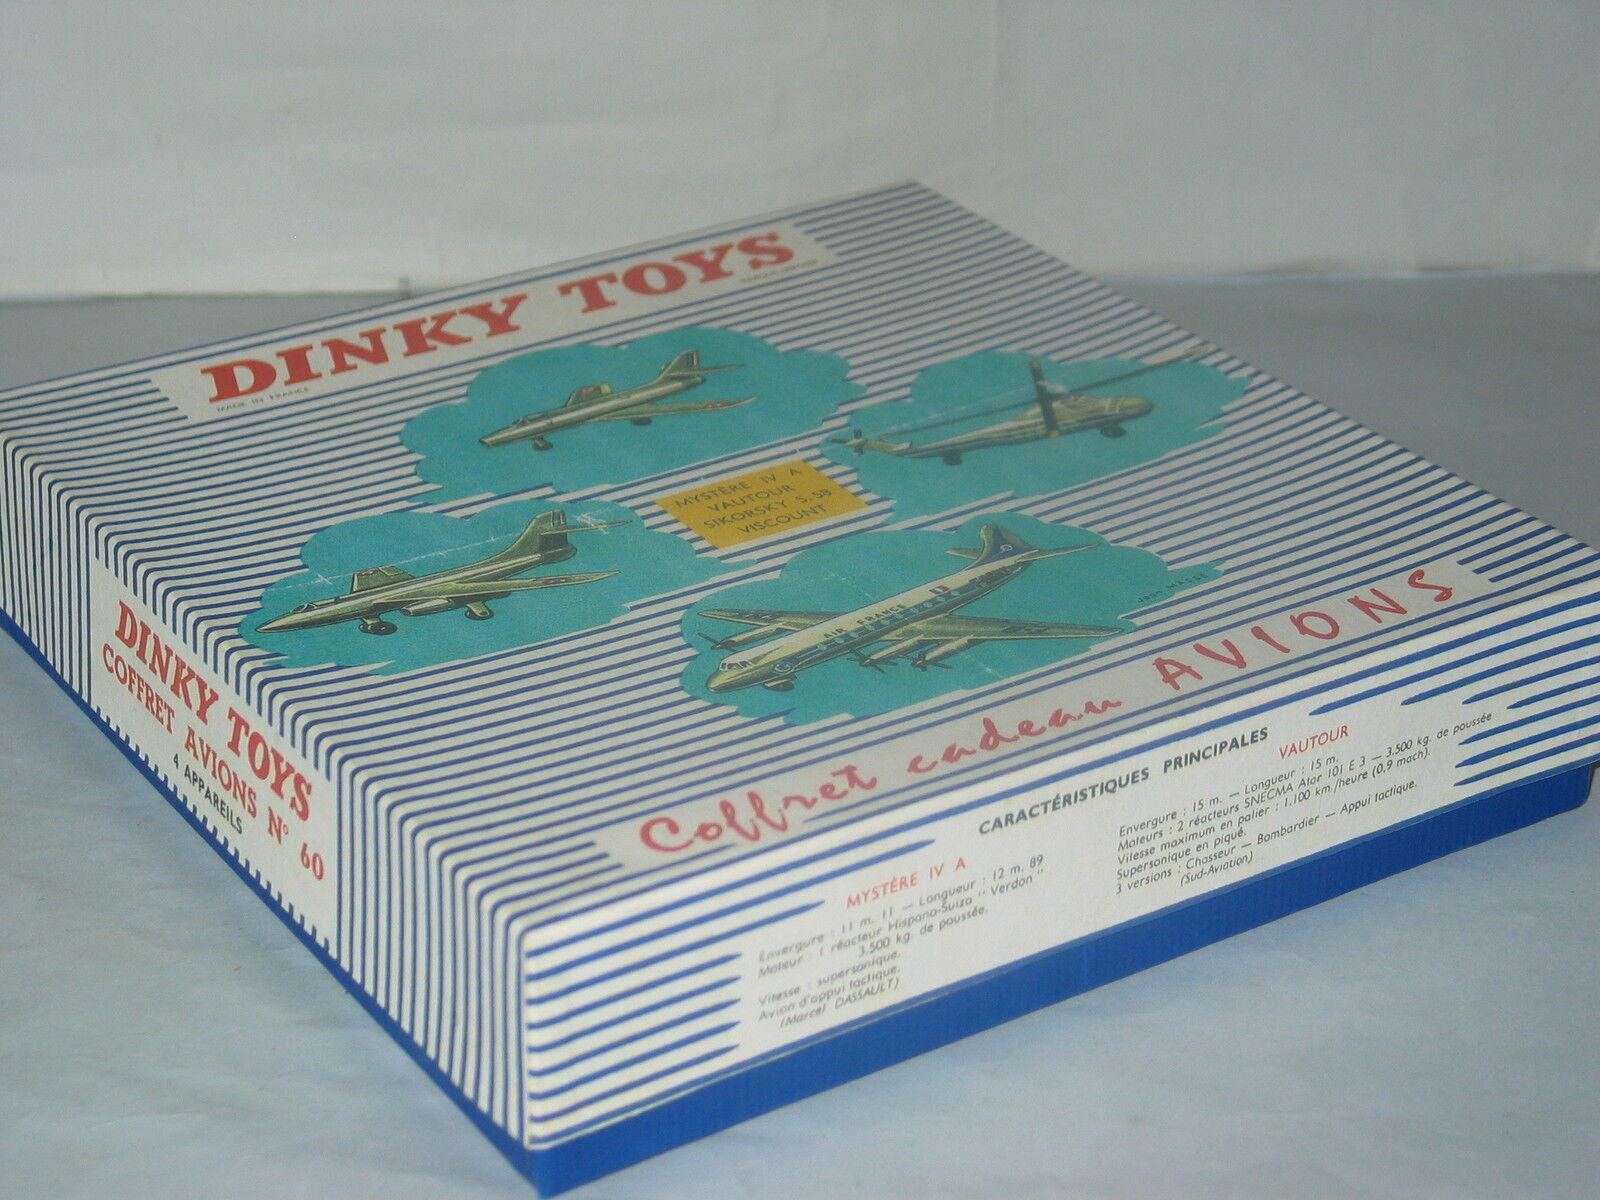 (Boite Copie Dinky Toys) 60 Coffret avions